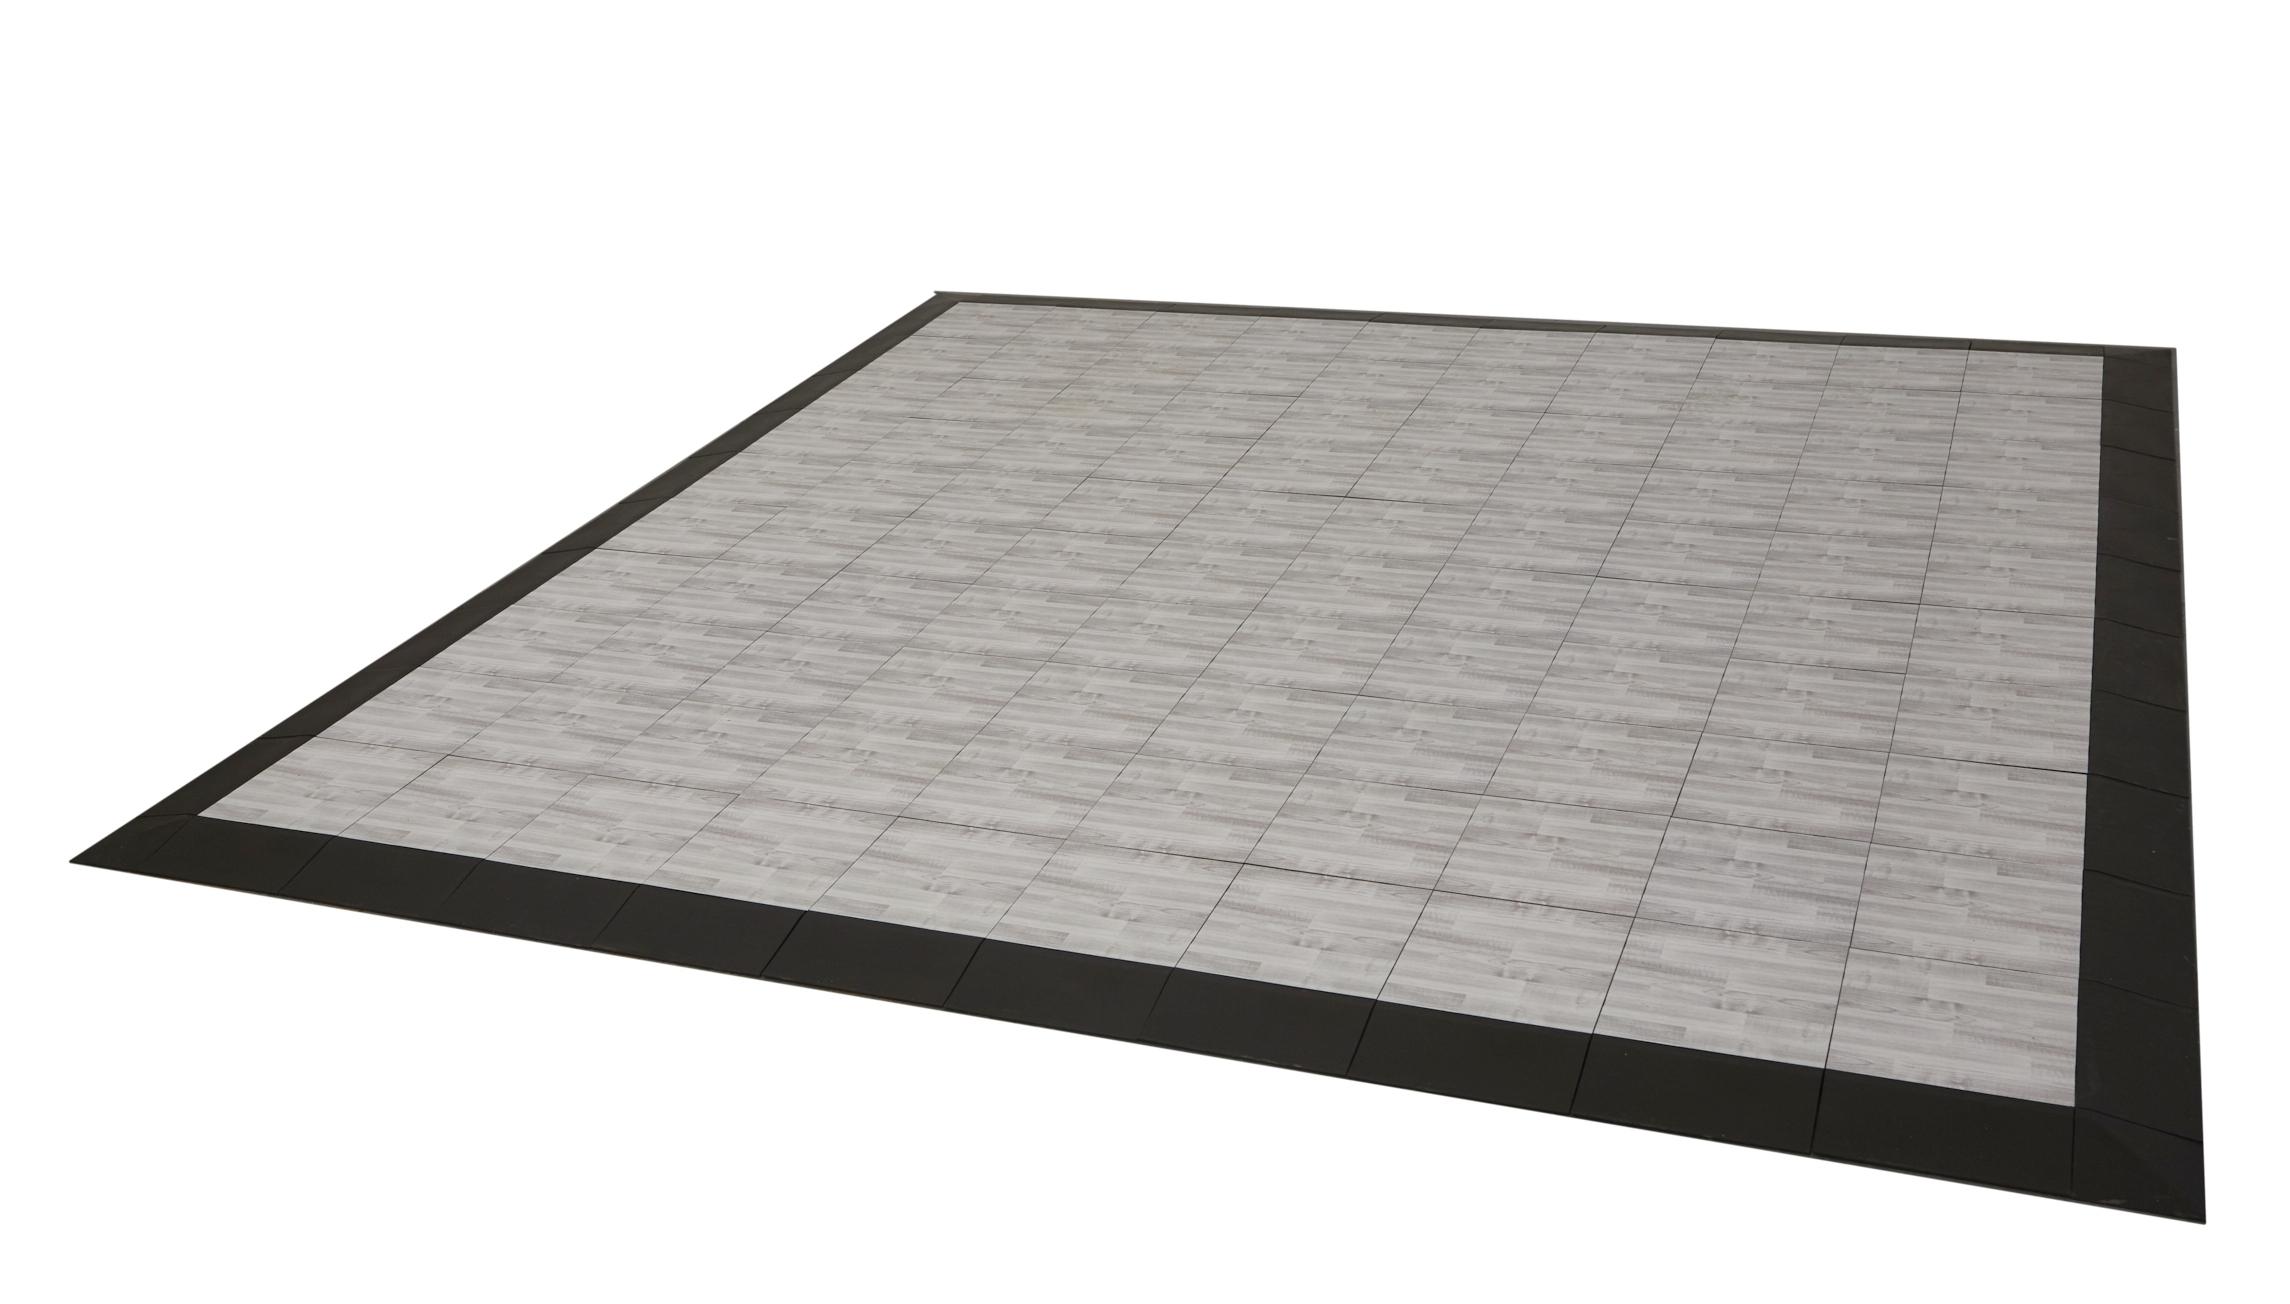 Modular exhibit floors